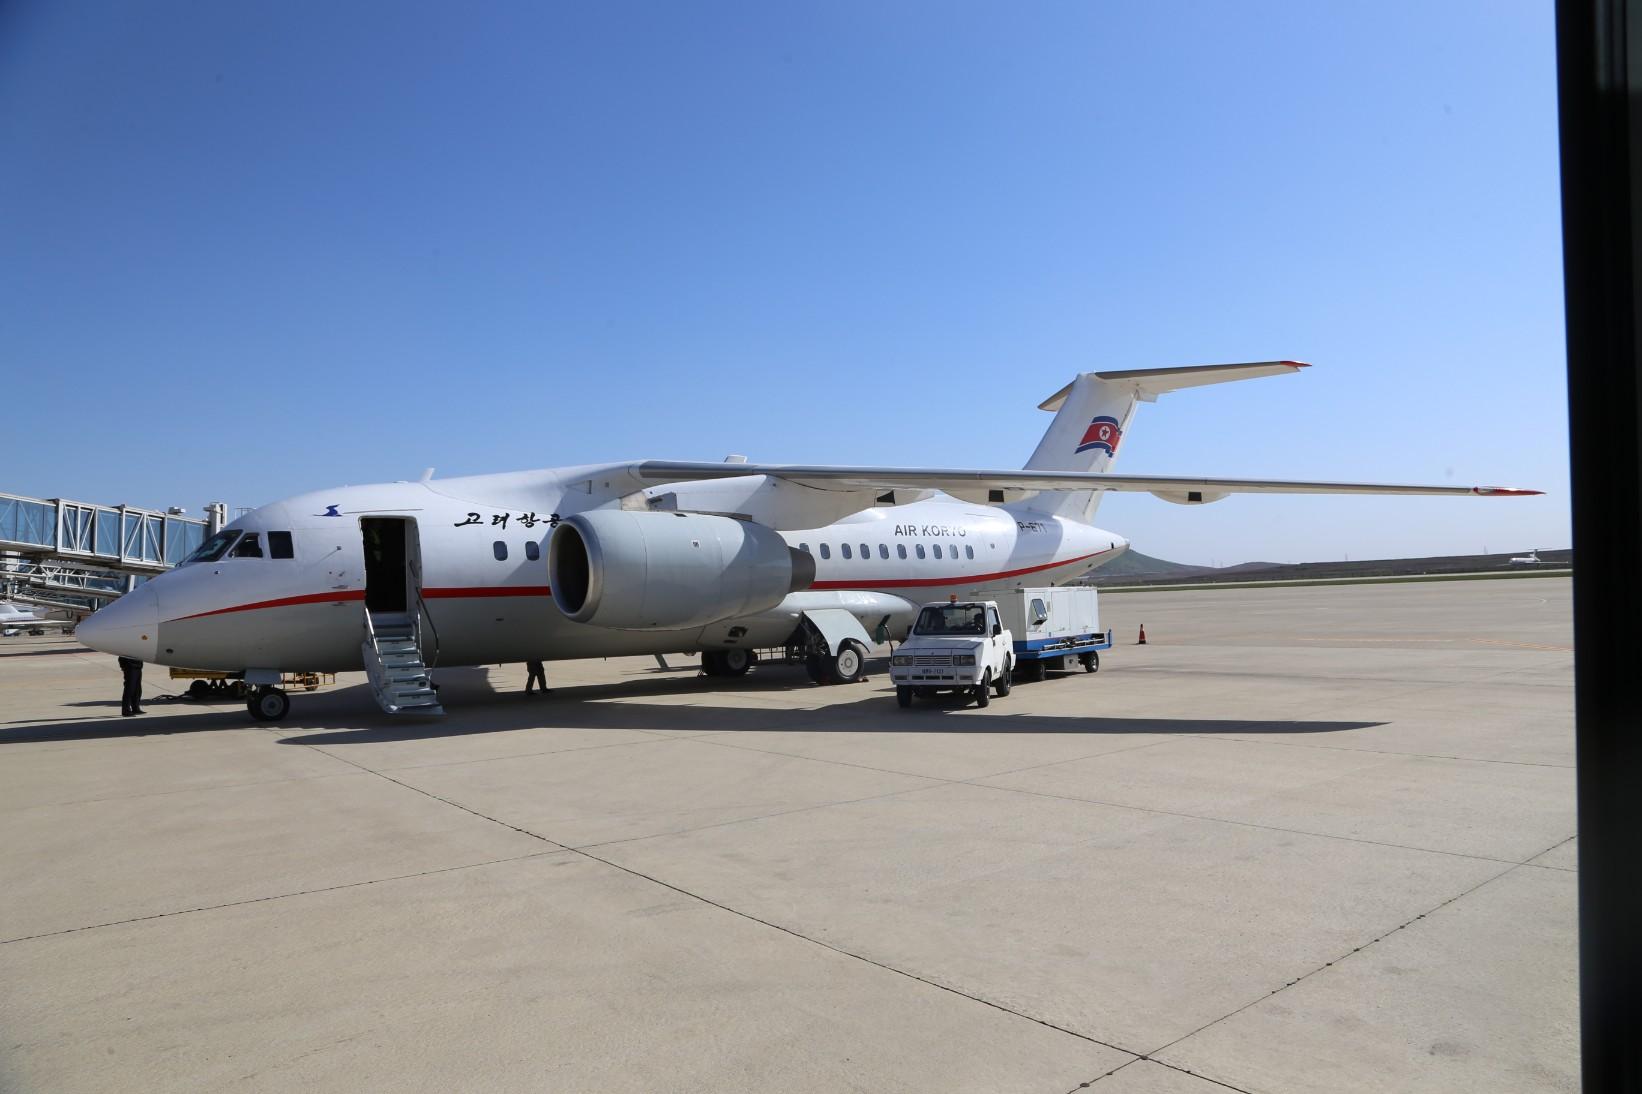 flight from Shenyang to Pyongyang